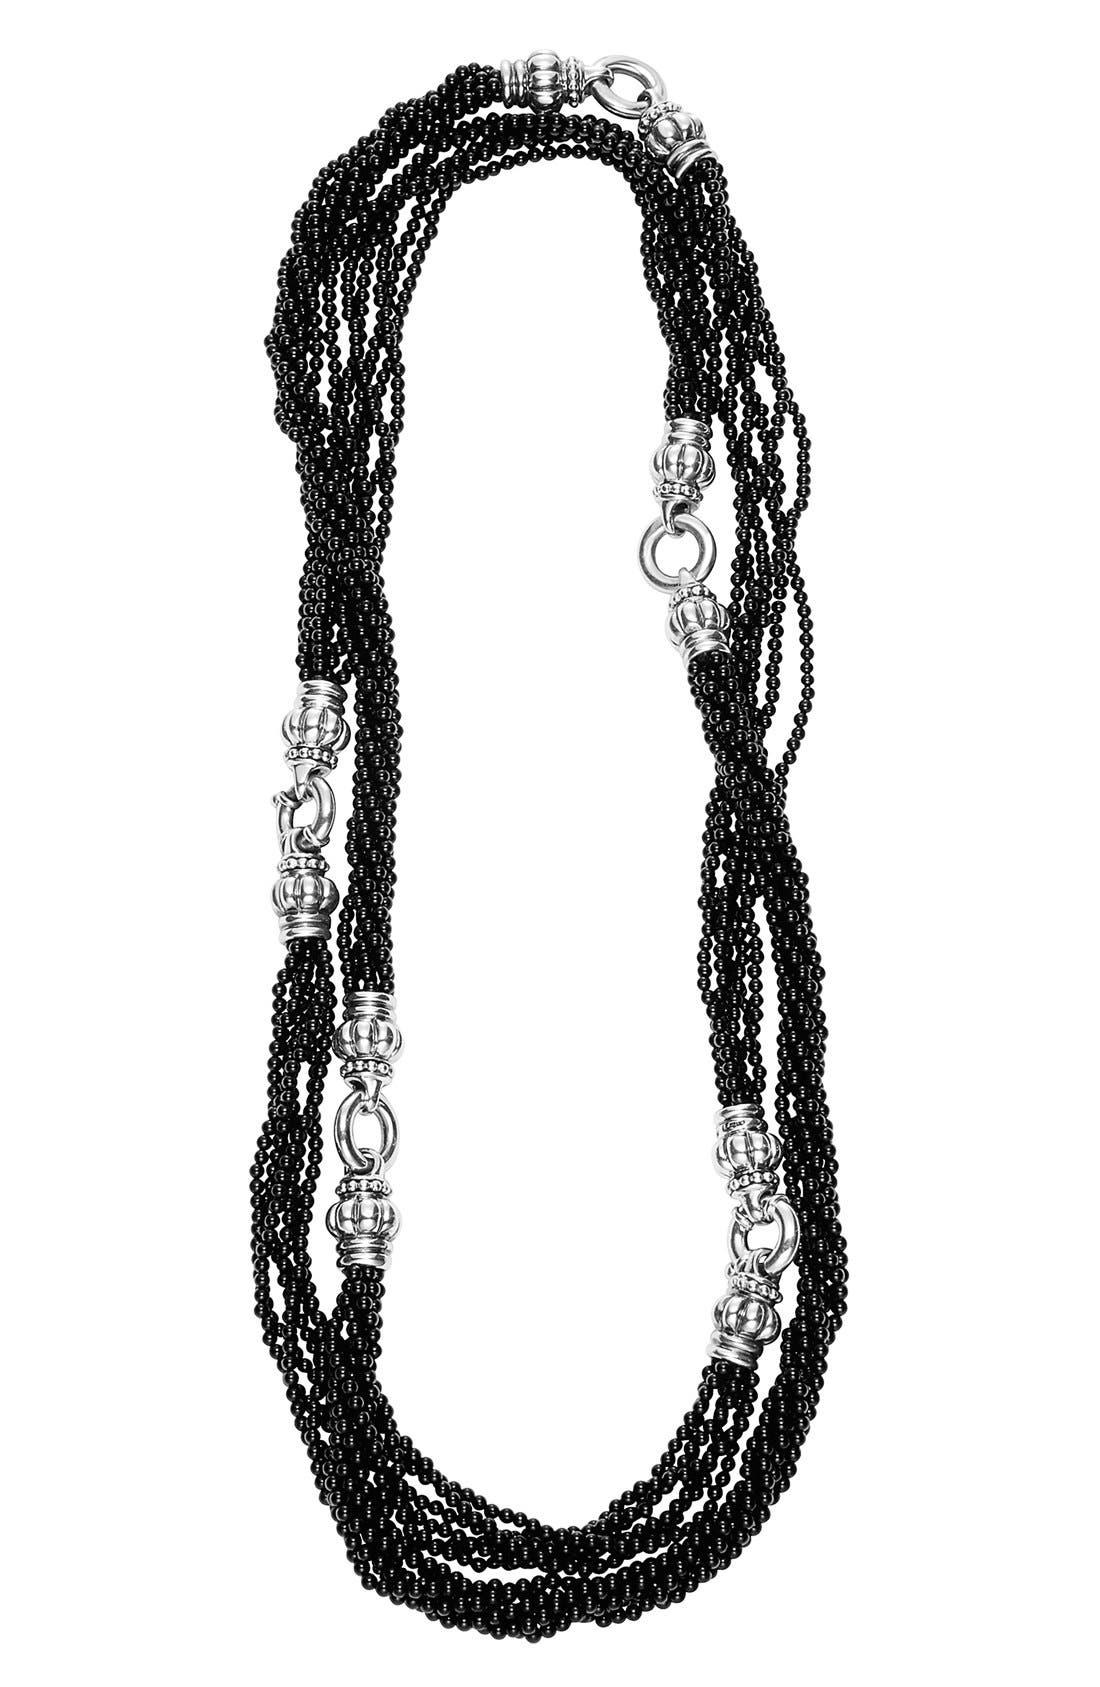 'Black Caviar' Beaded Necklace,                         Main,                         color, Black Caviar/ Silver